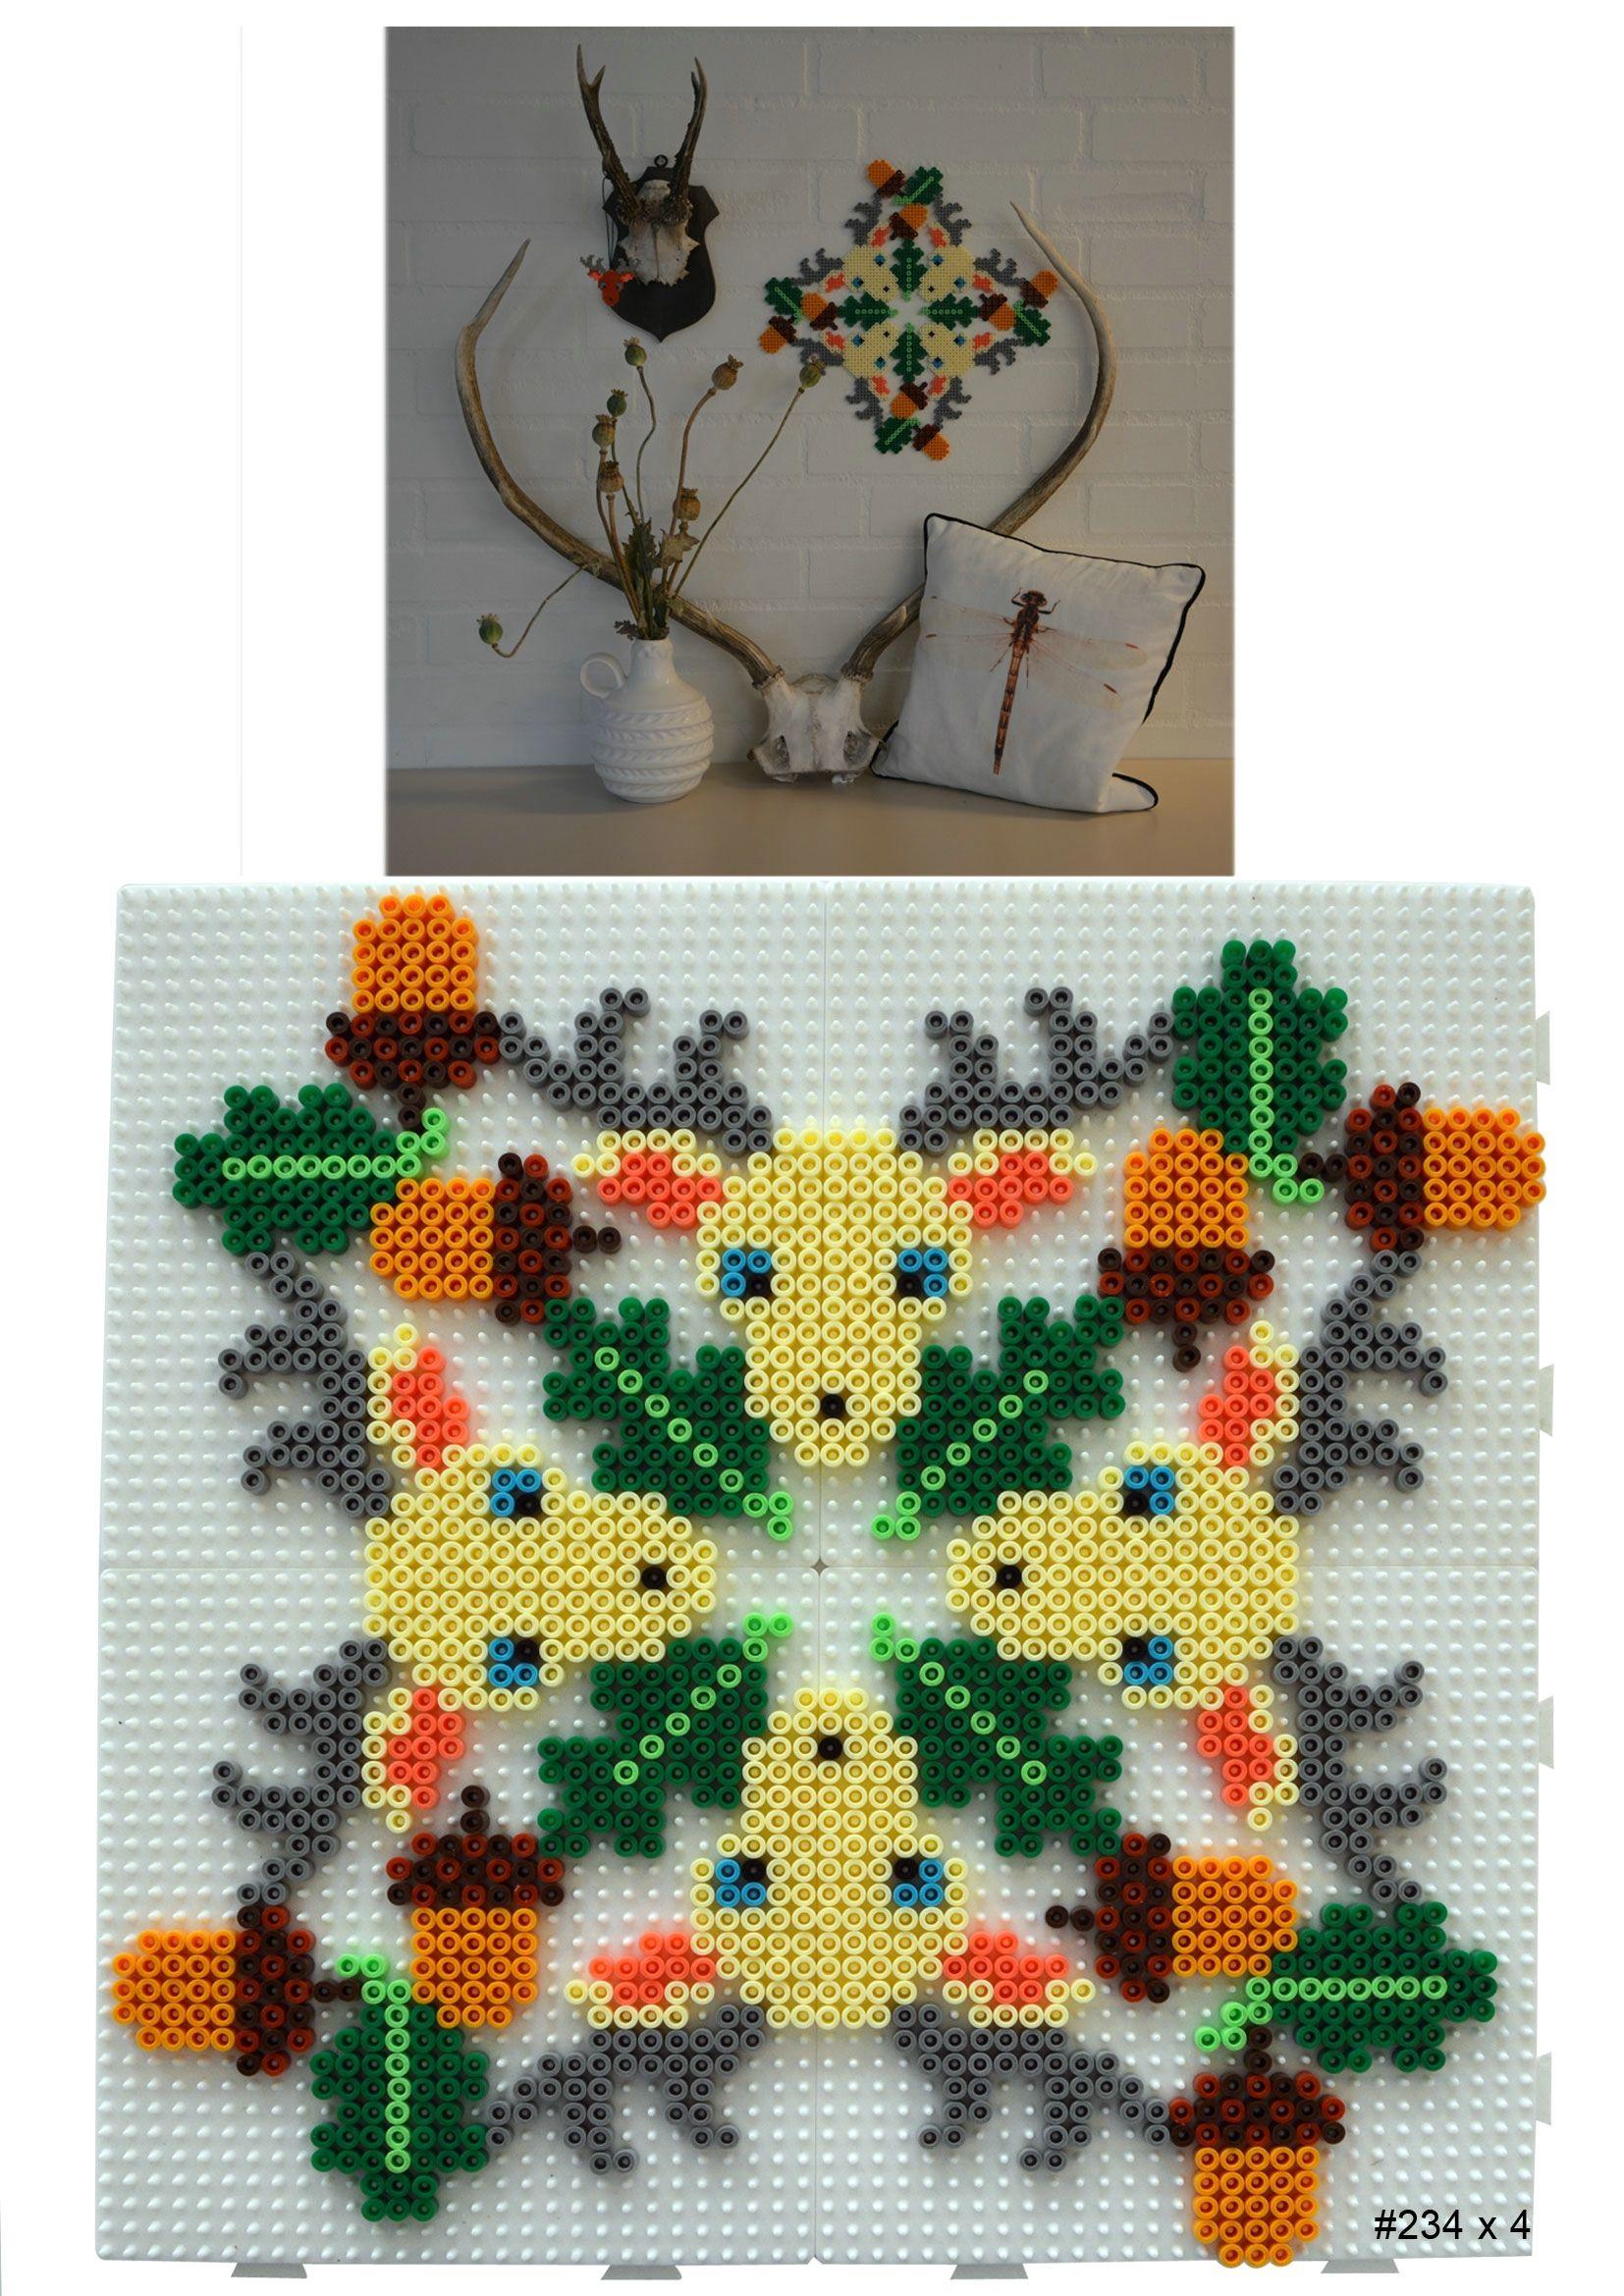 HAMA - Deer-icon | HAMA HAMA | Pinterest | Perler beads, Wall ...